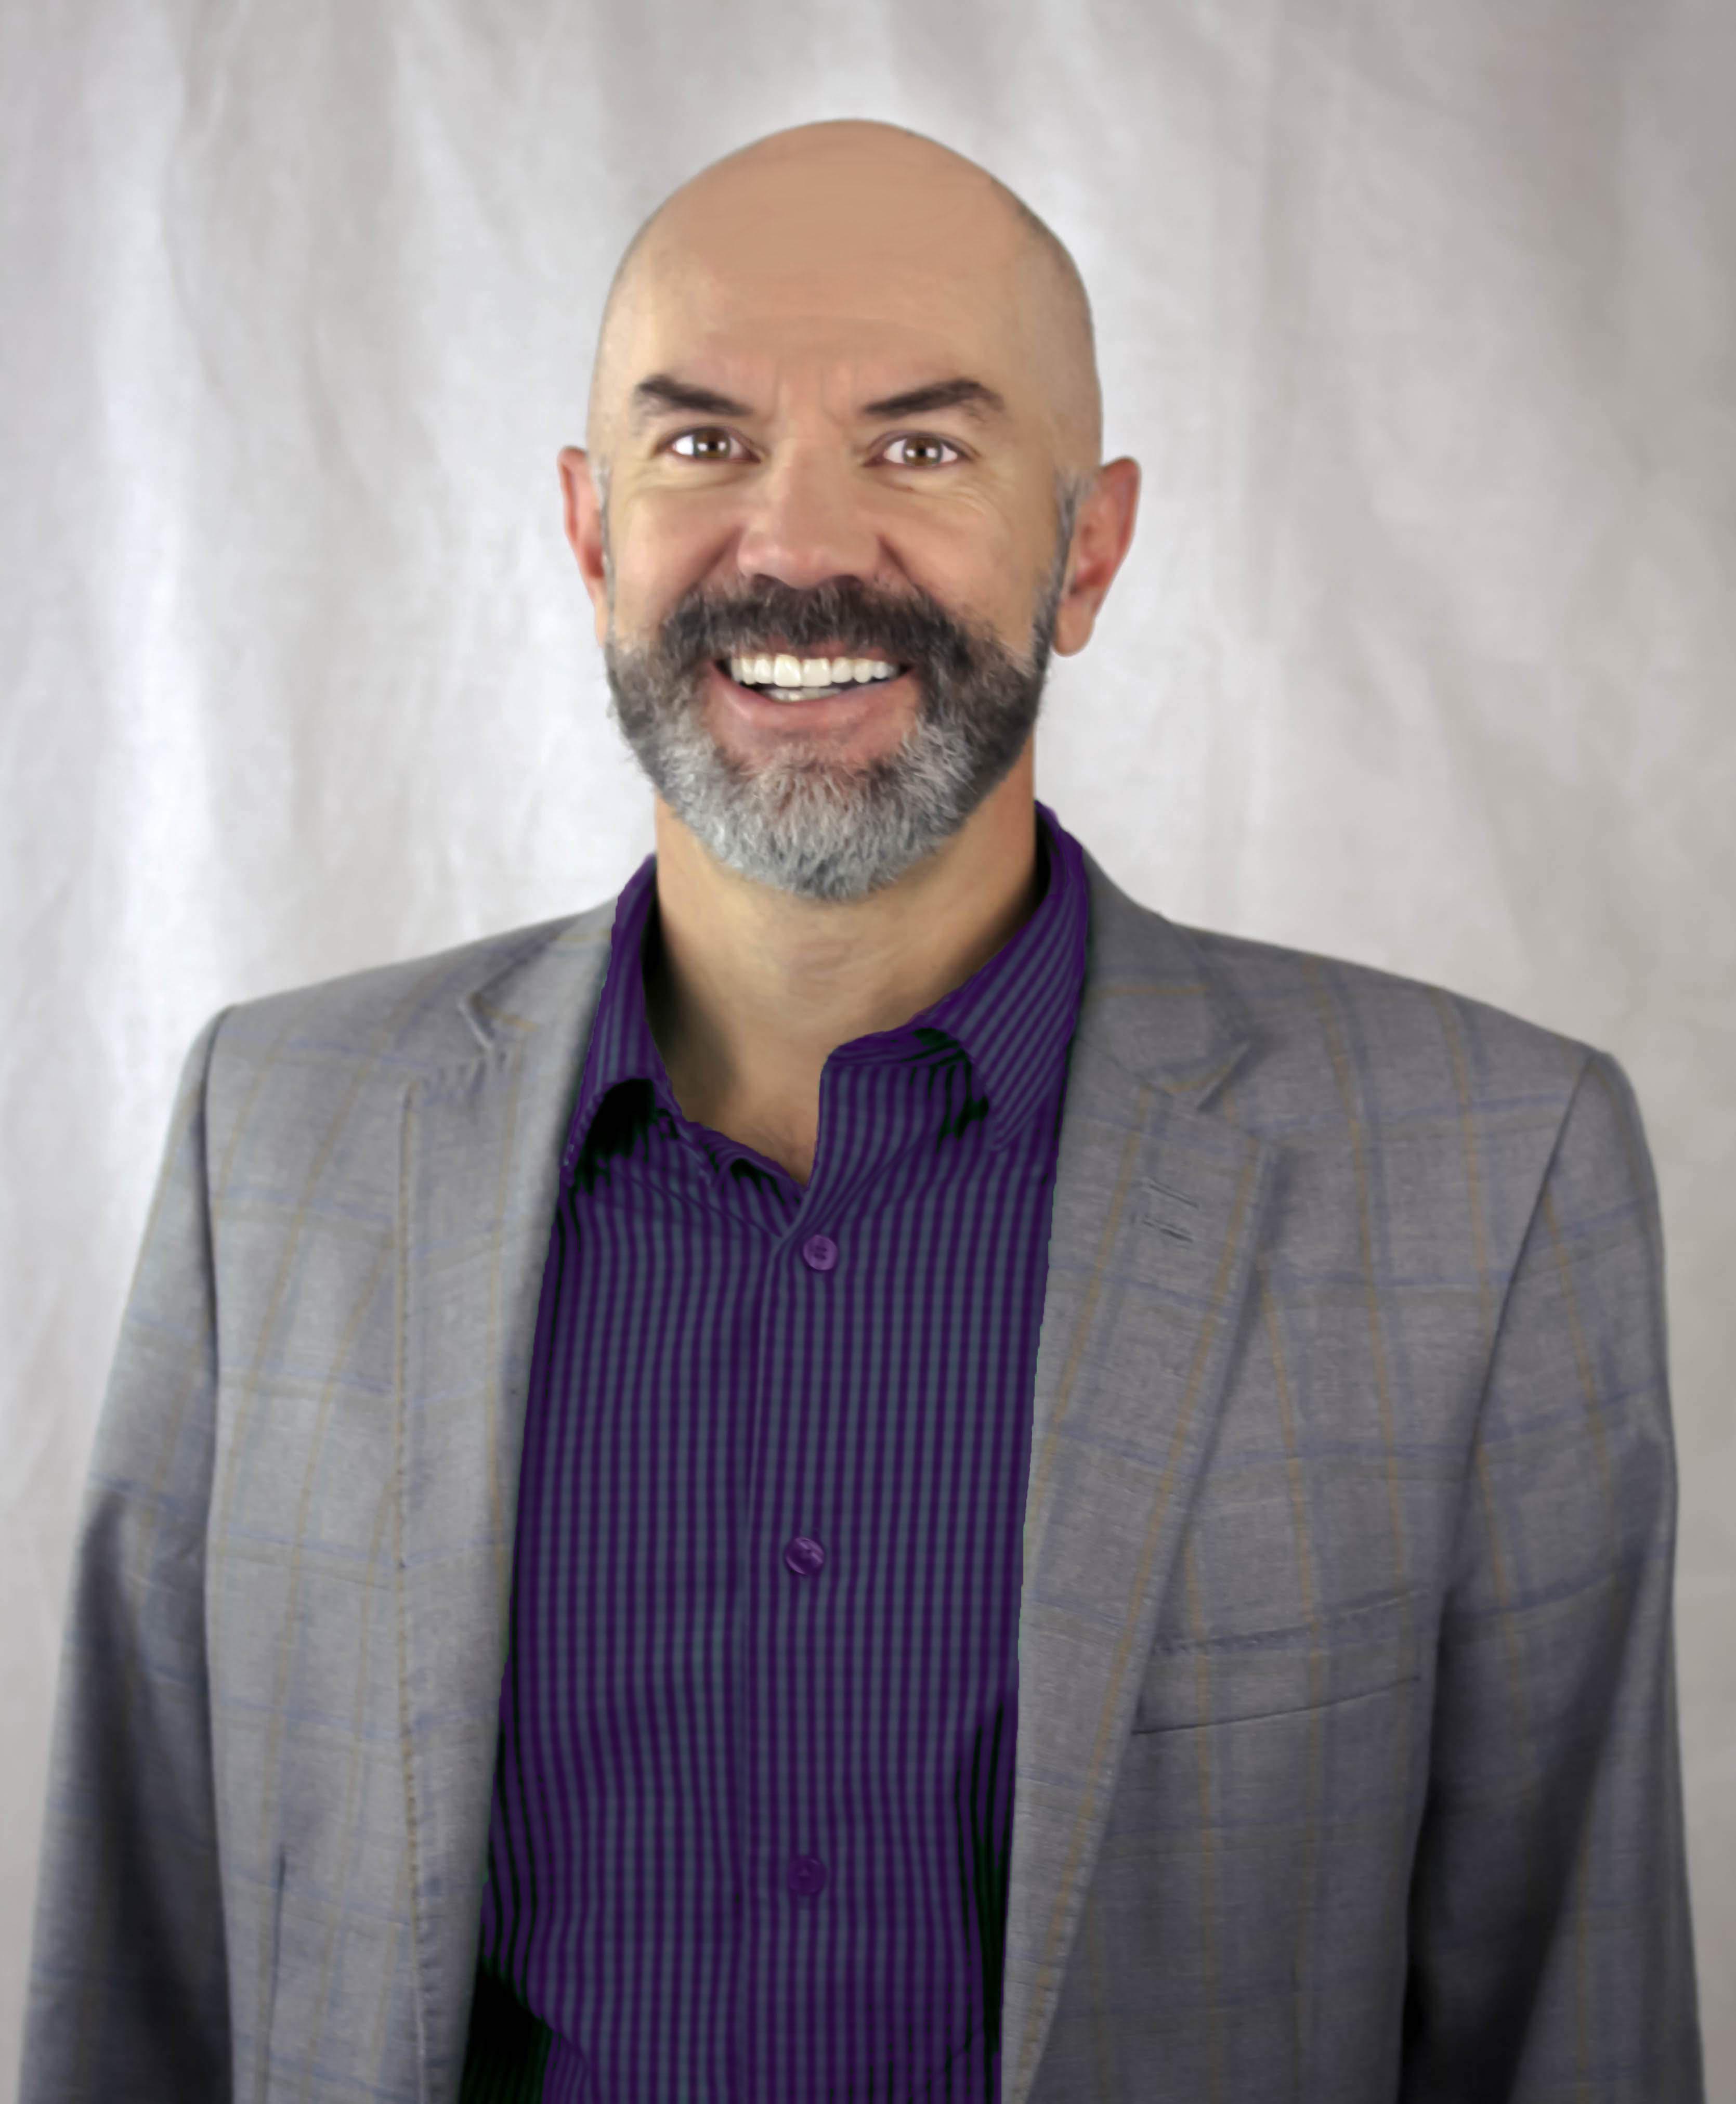 Shawn Beus